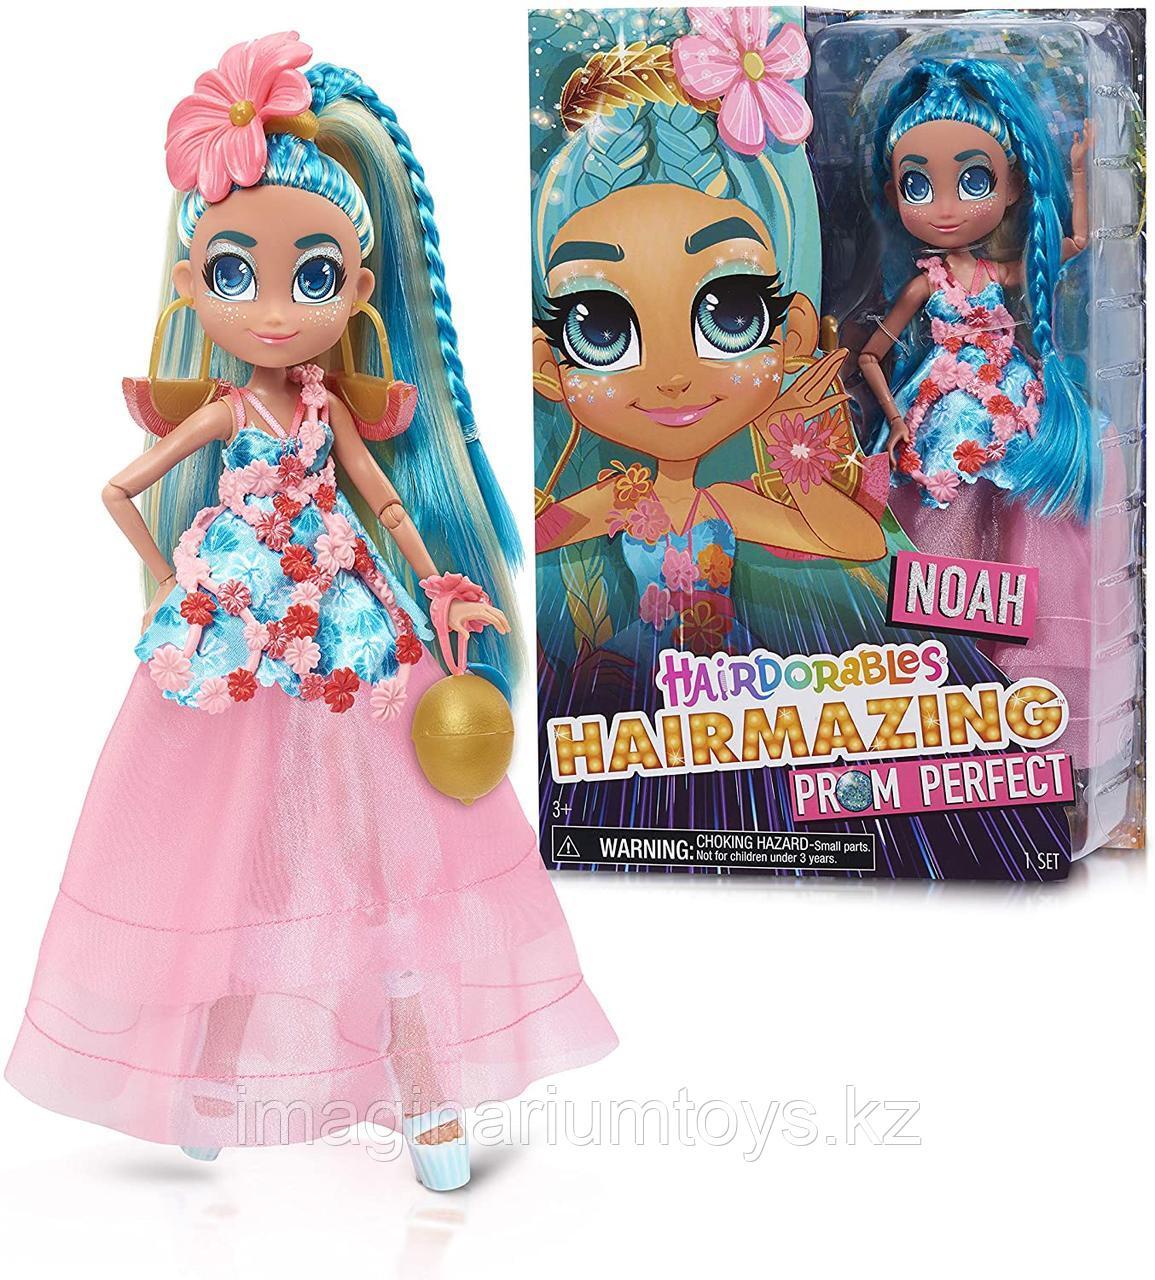 Кукла Hairdorables Hairmazing Noah Праздничная